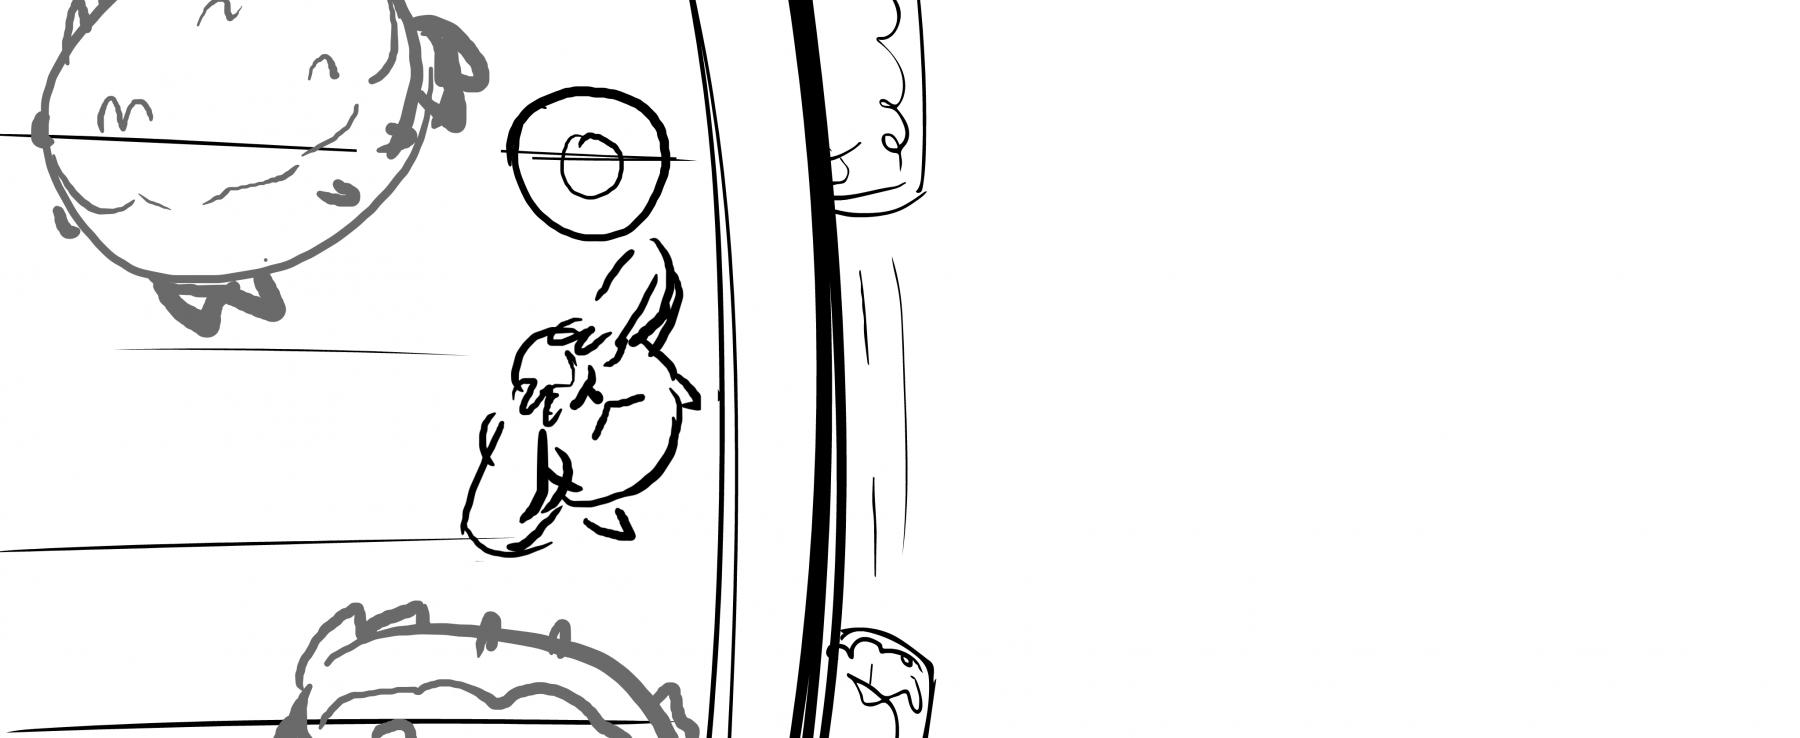 Nut-Thumbnail-Rough-Board003431